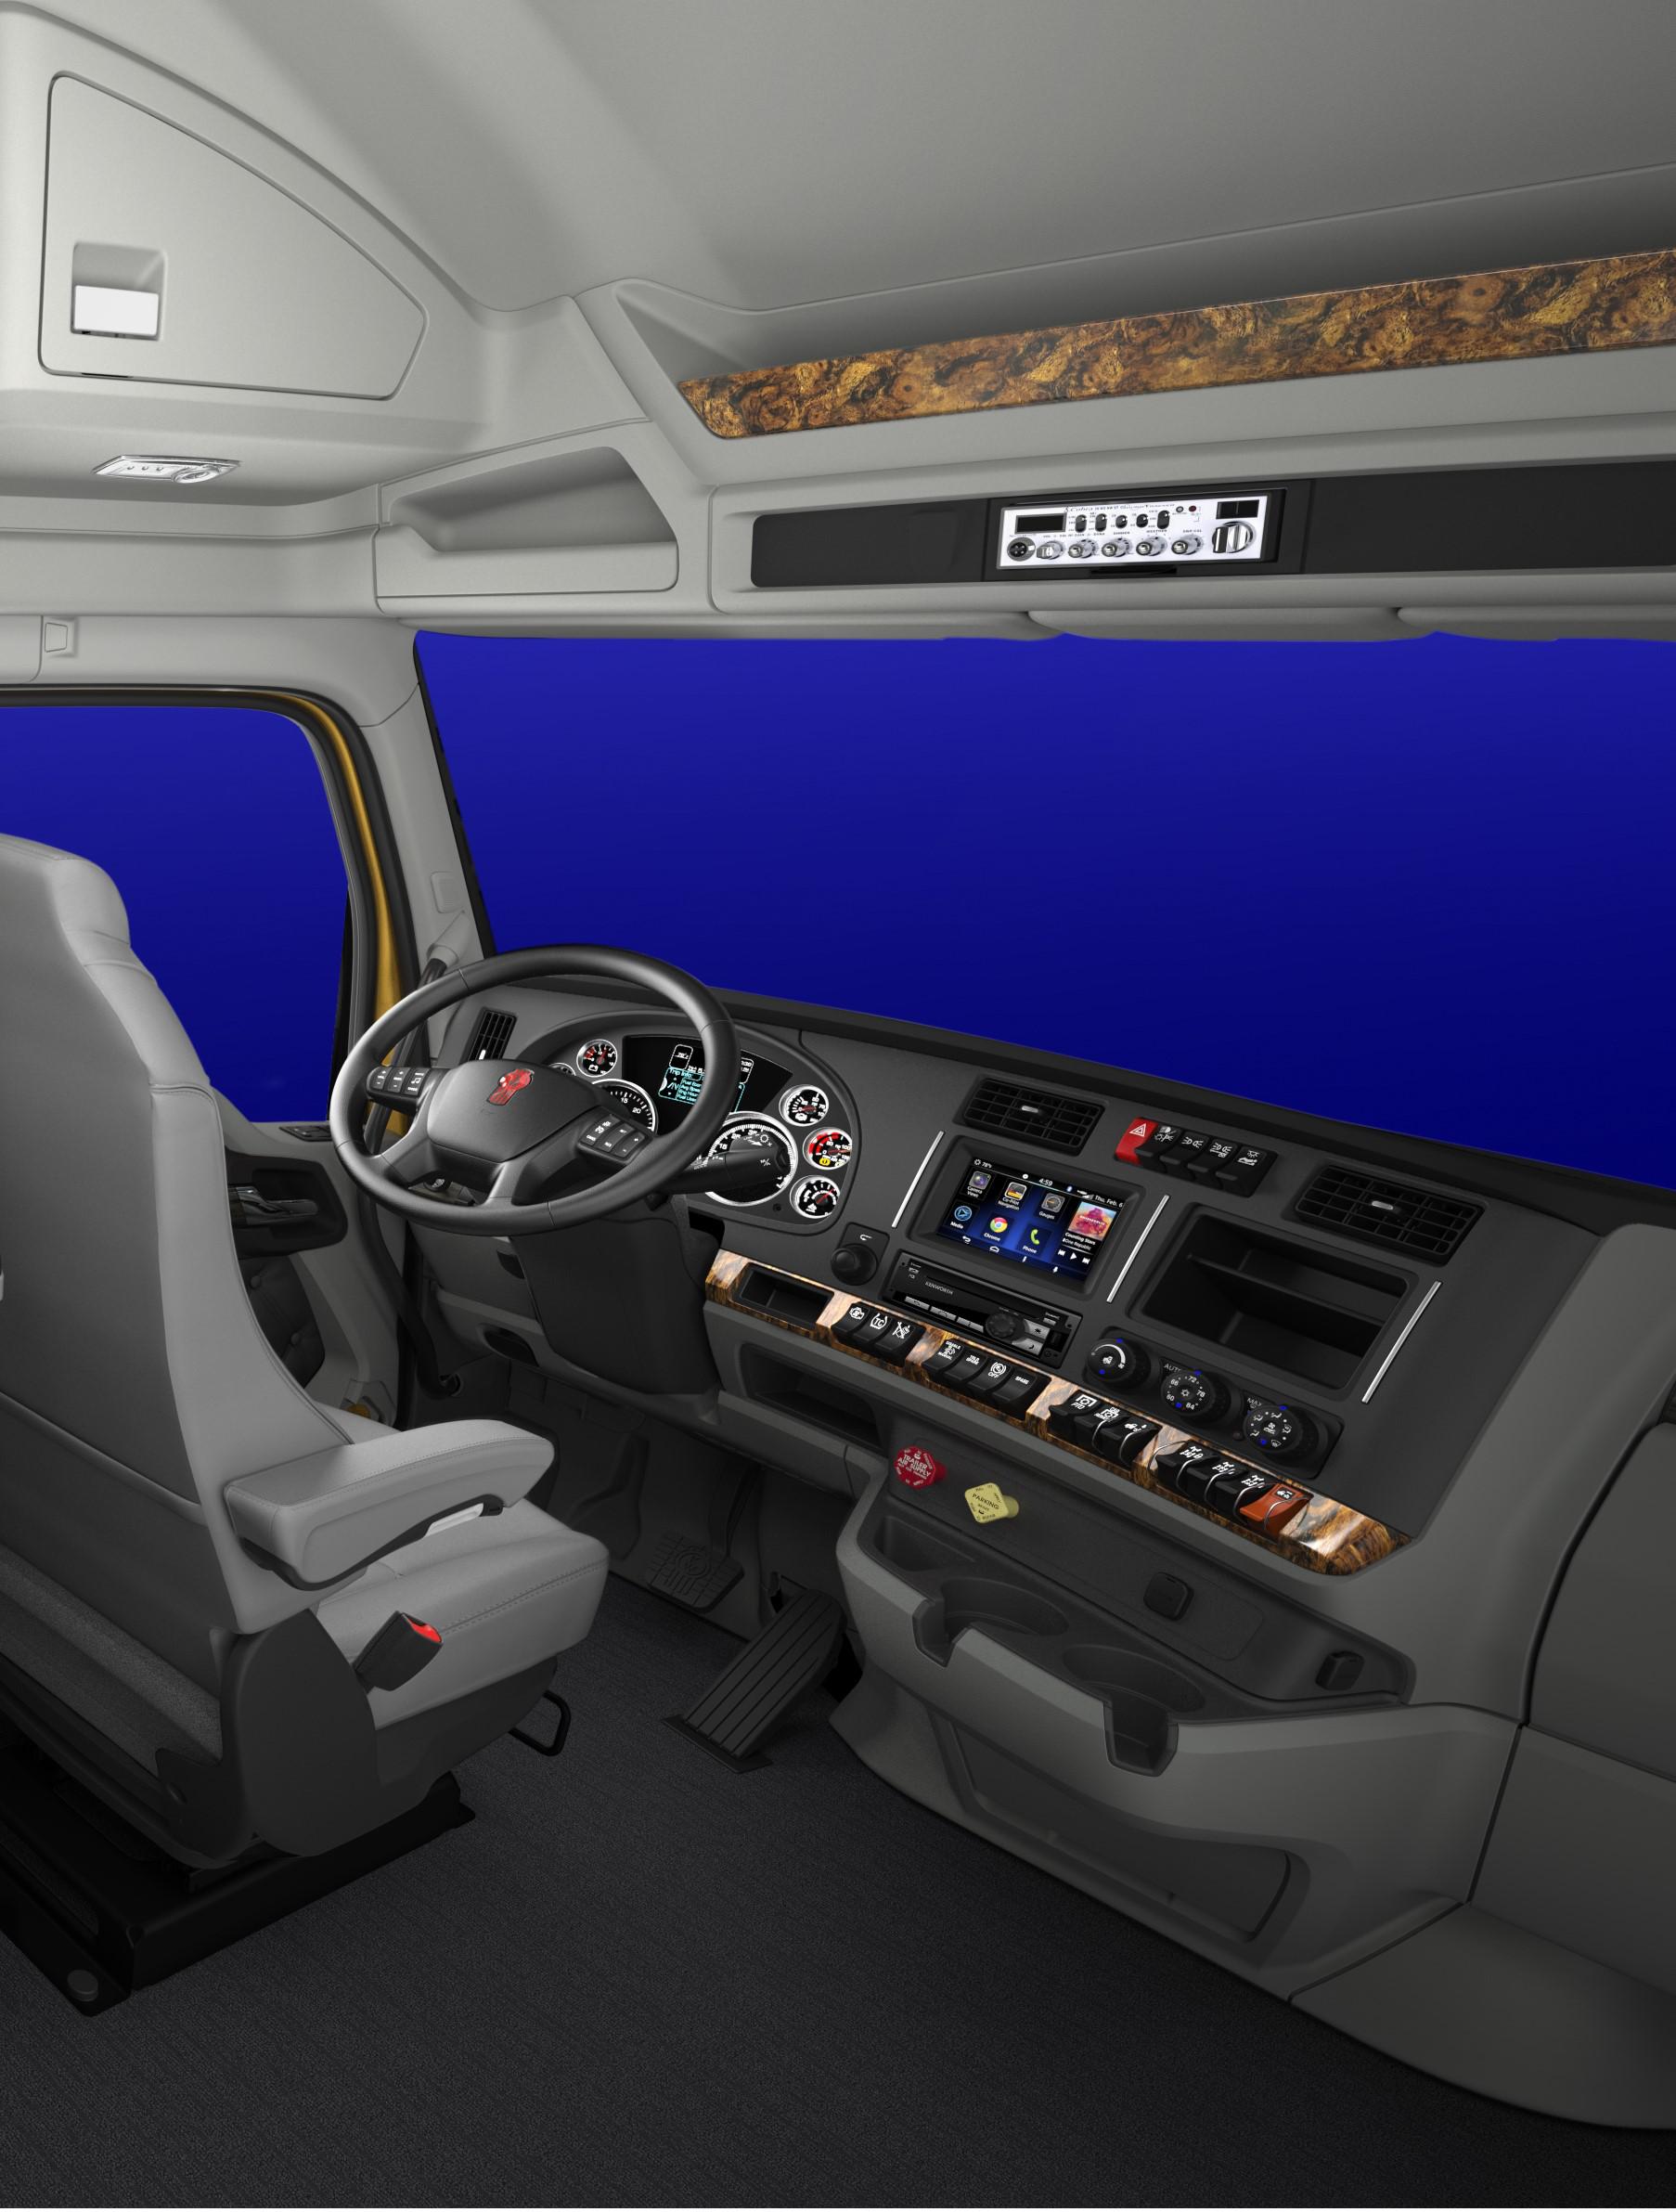 Kenworth T680 For Sale >> Kenworth announces new cab interior color schemes | Medium Duty Work Truck Info